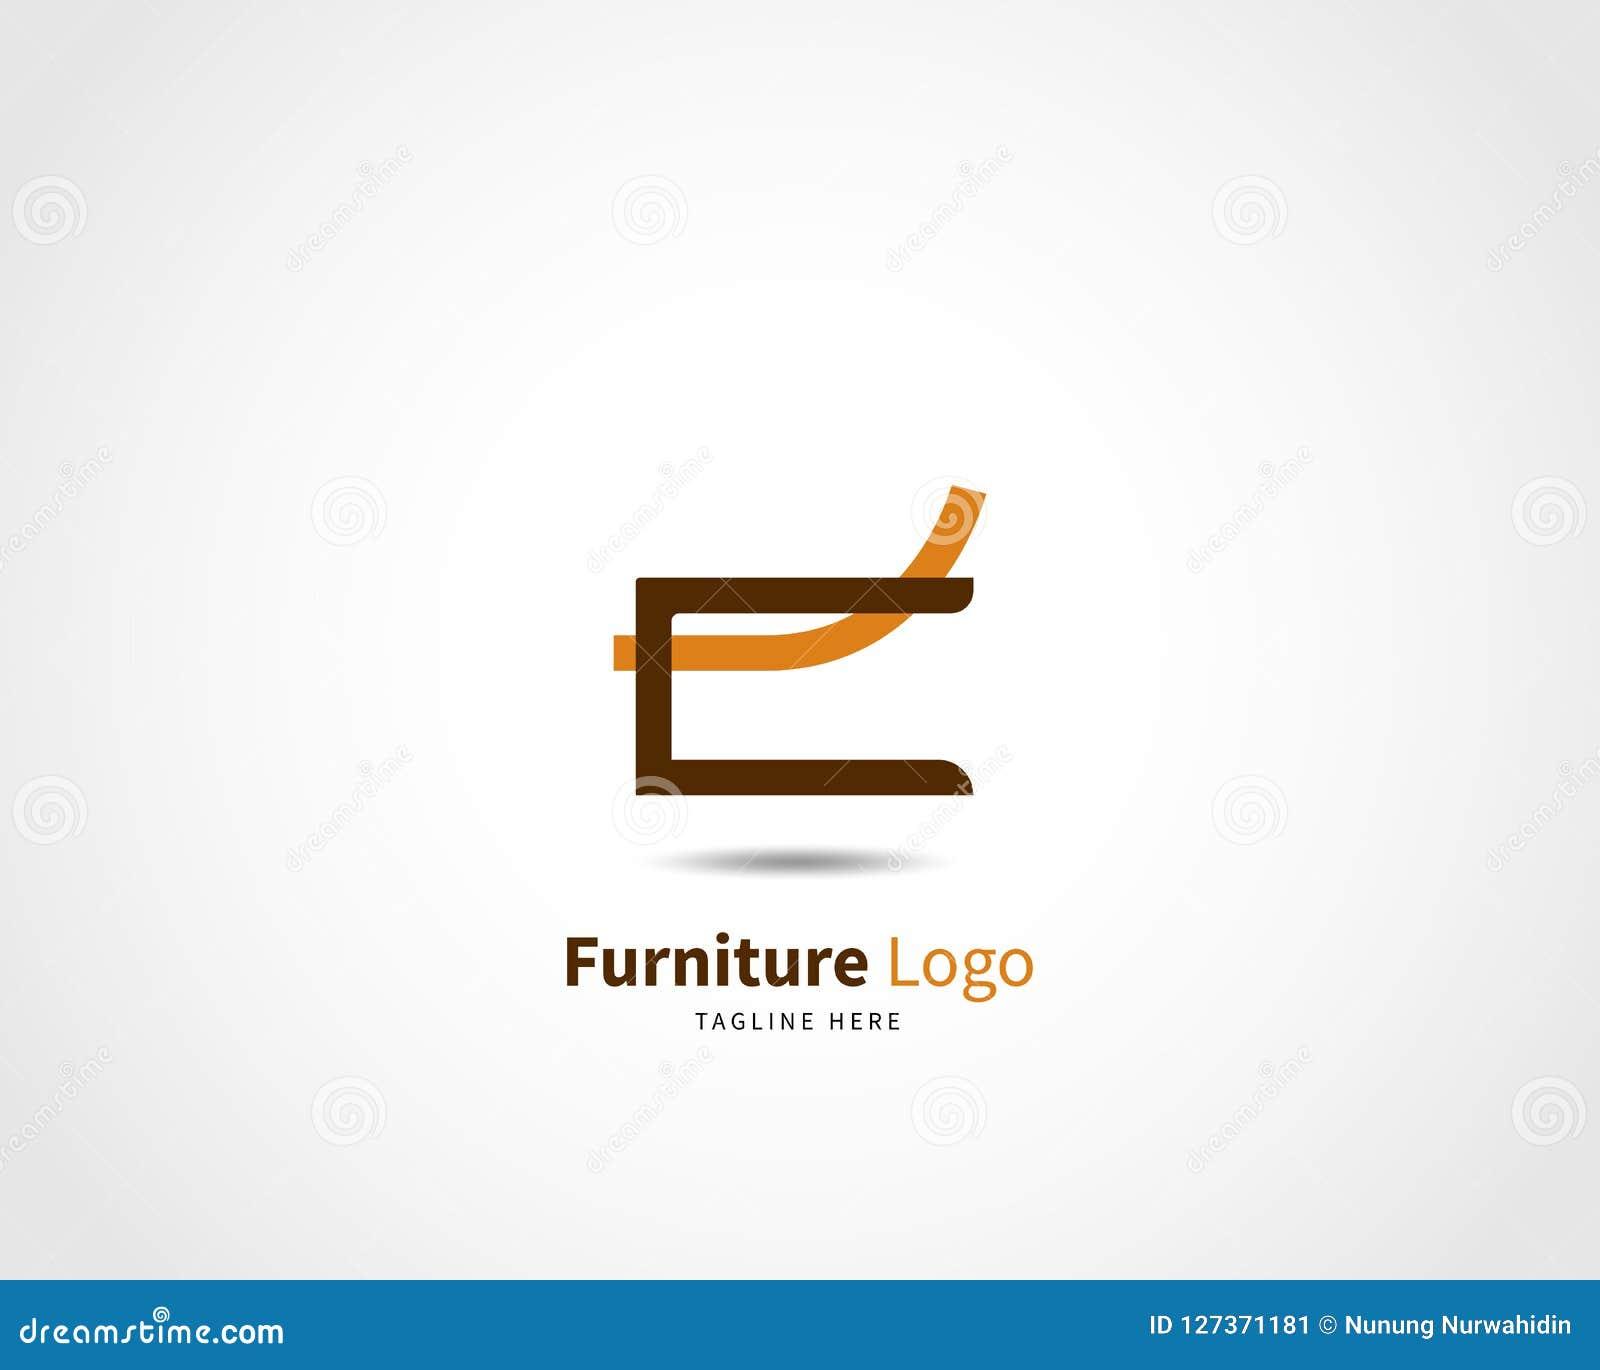 Modern Furniture Logo Design Template Vector Illustration